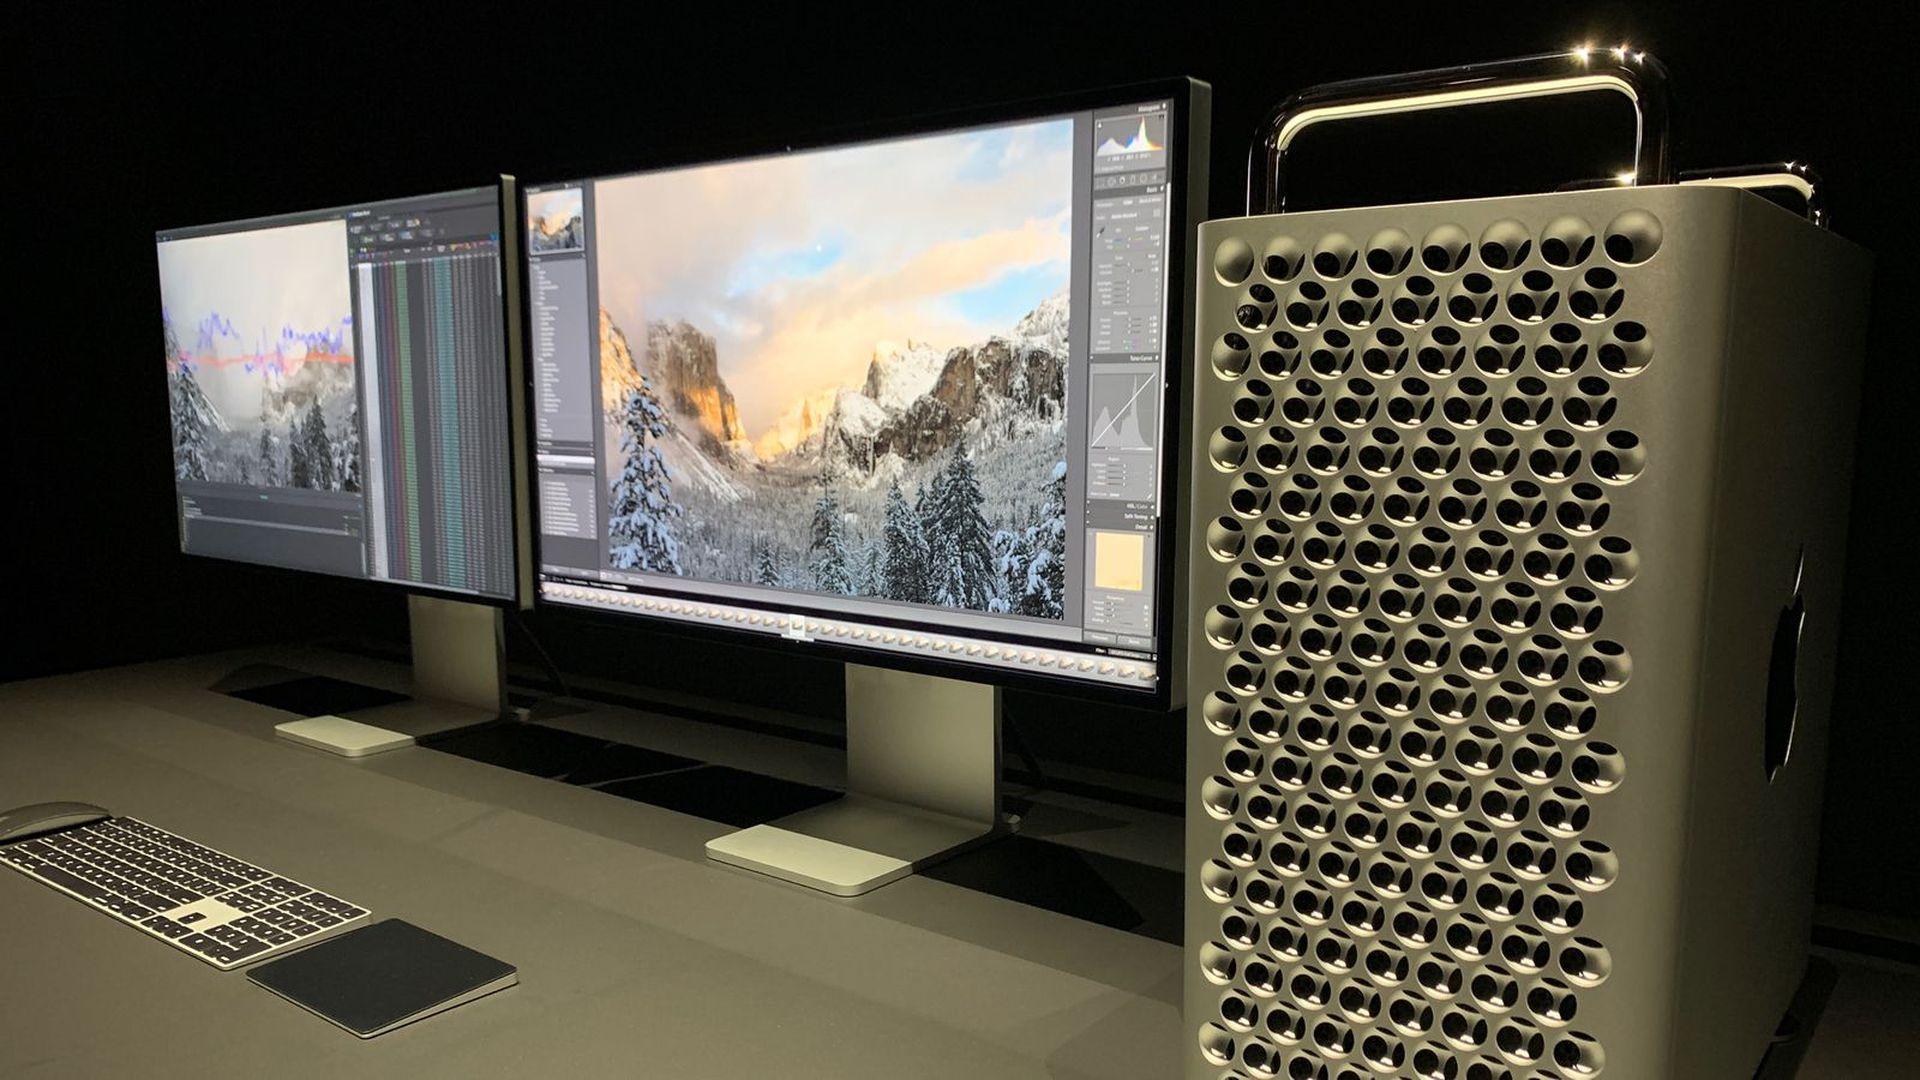 Apple's Mac Pro